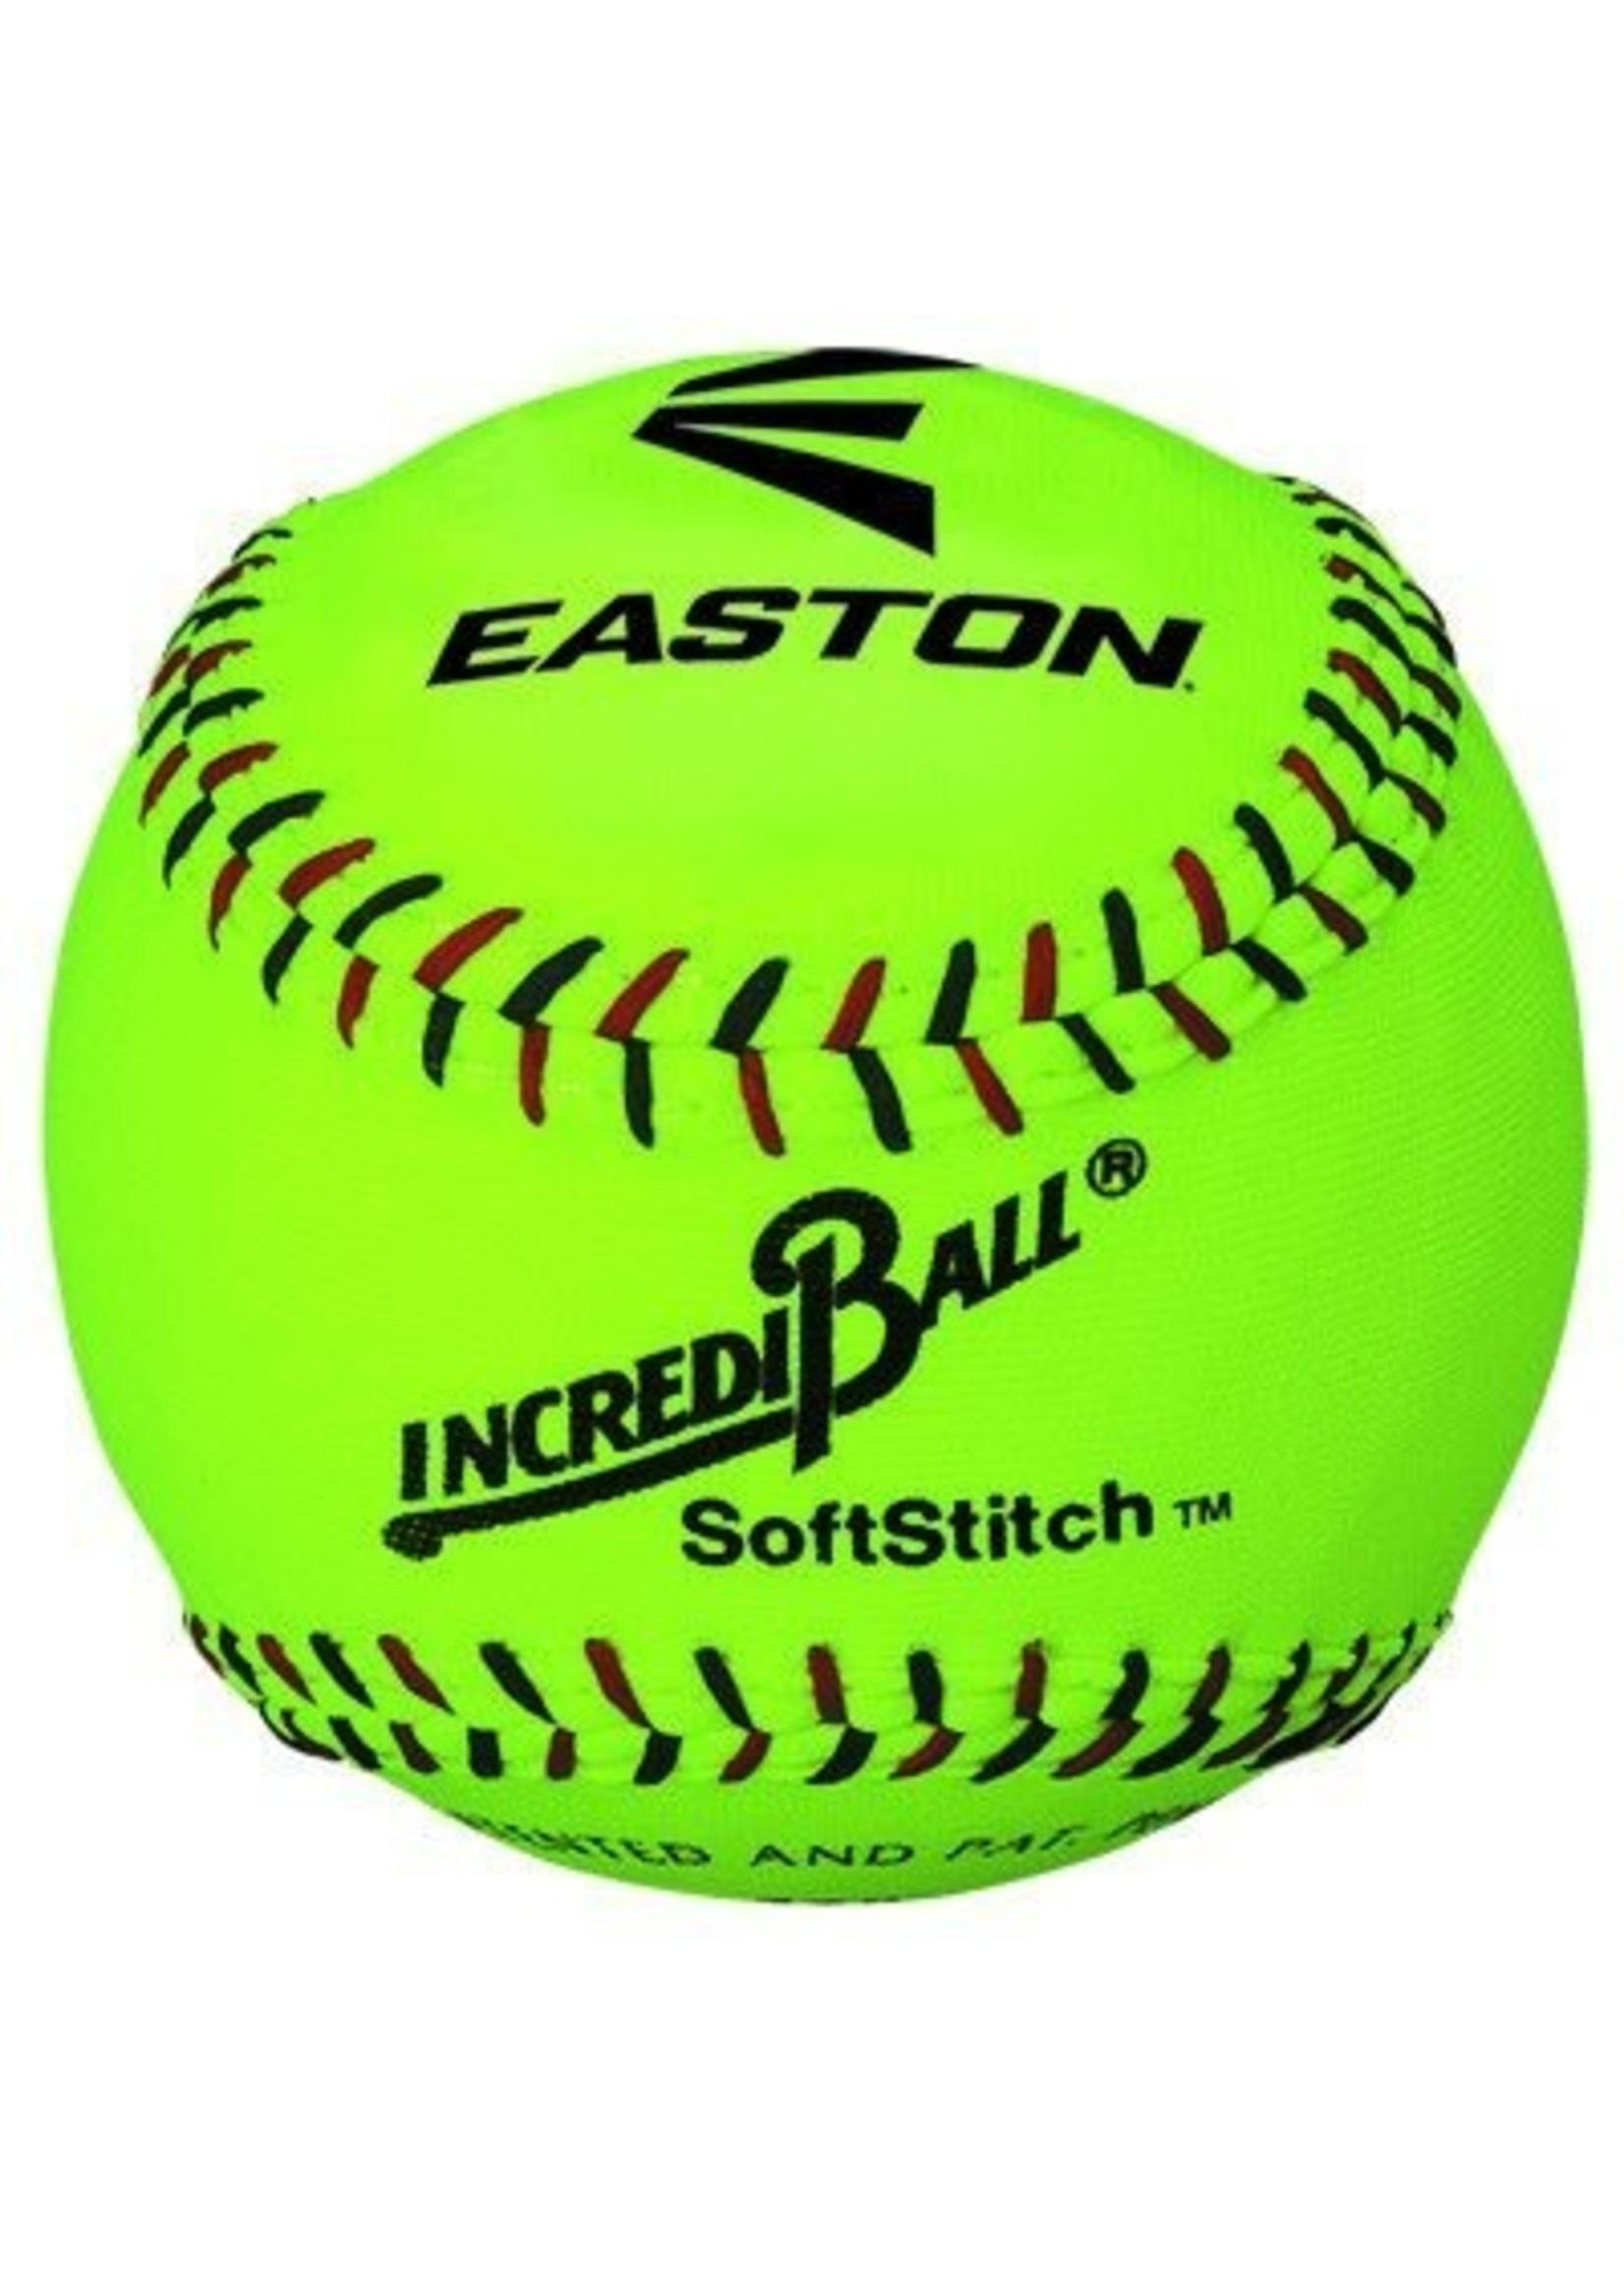 "Easton Baseball (Canada) EASTON INCREDI-BALL 12"" NEON SOFTSTITCH BOX OF 12 SOFTBALL"